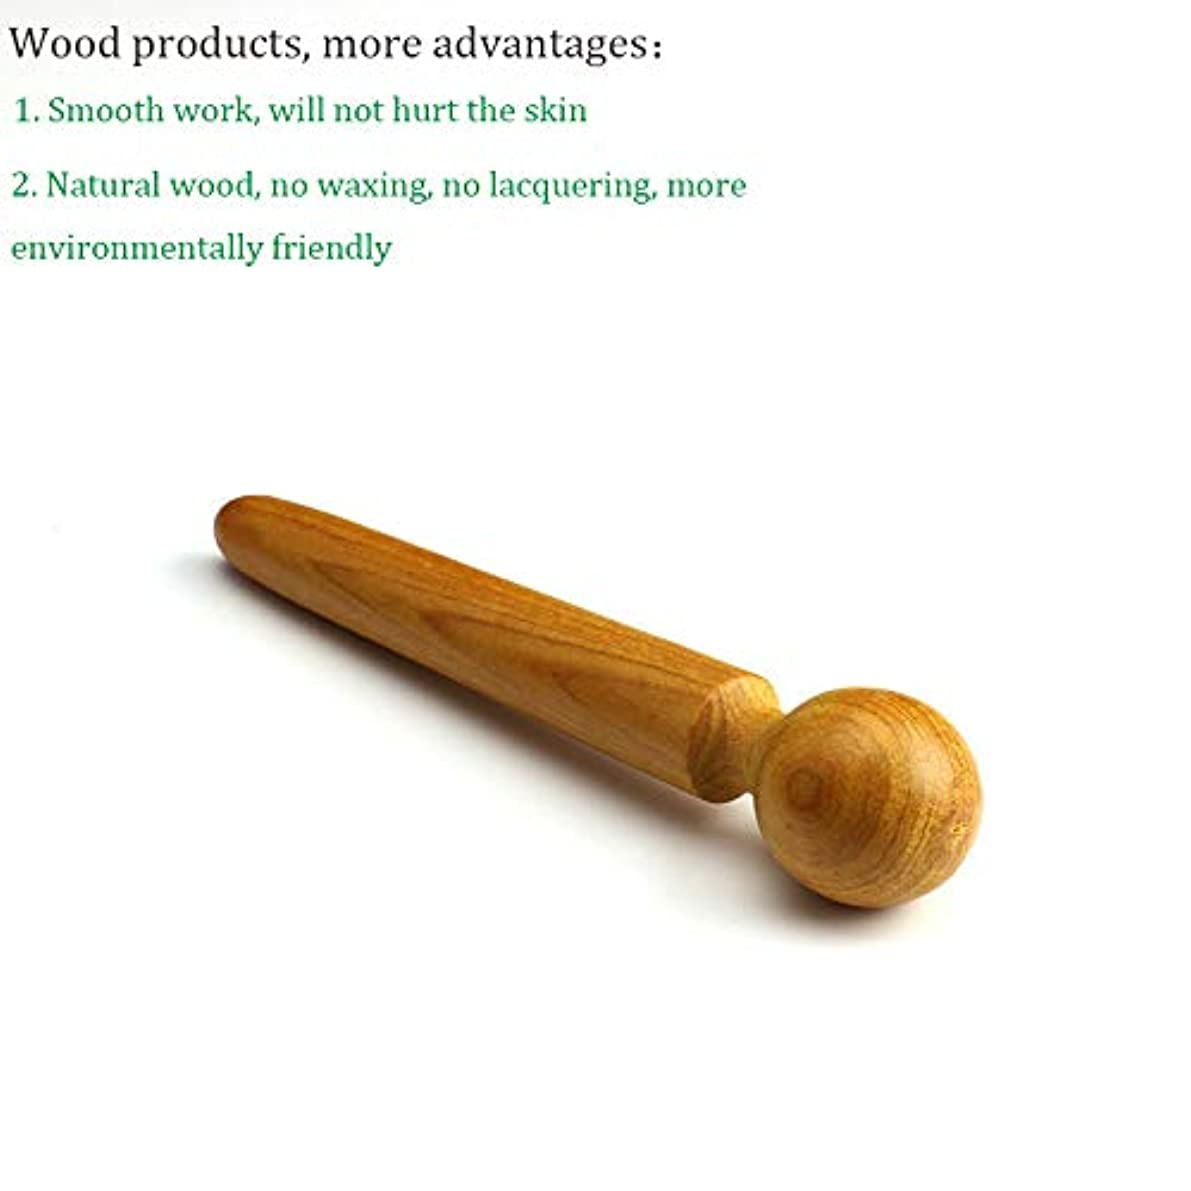 DC 木製マッサージャー 木製フットポイントスティック 鍼治療ポイントロッドSPAボディフットマッサージツール 疲労緩和